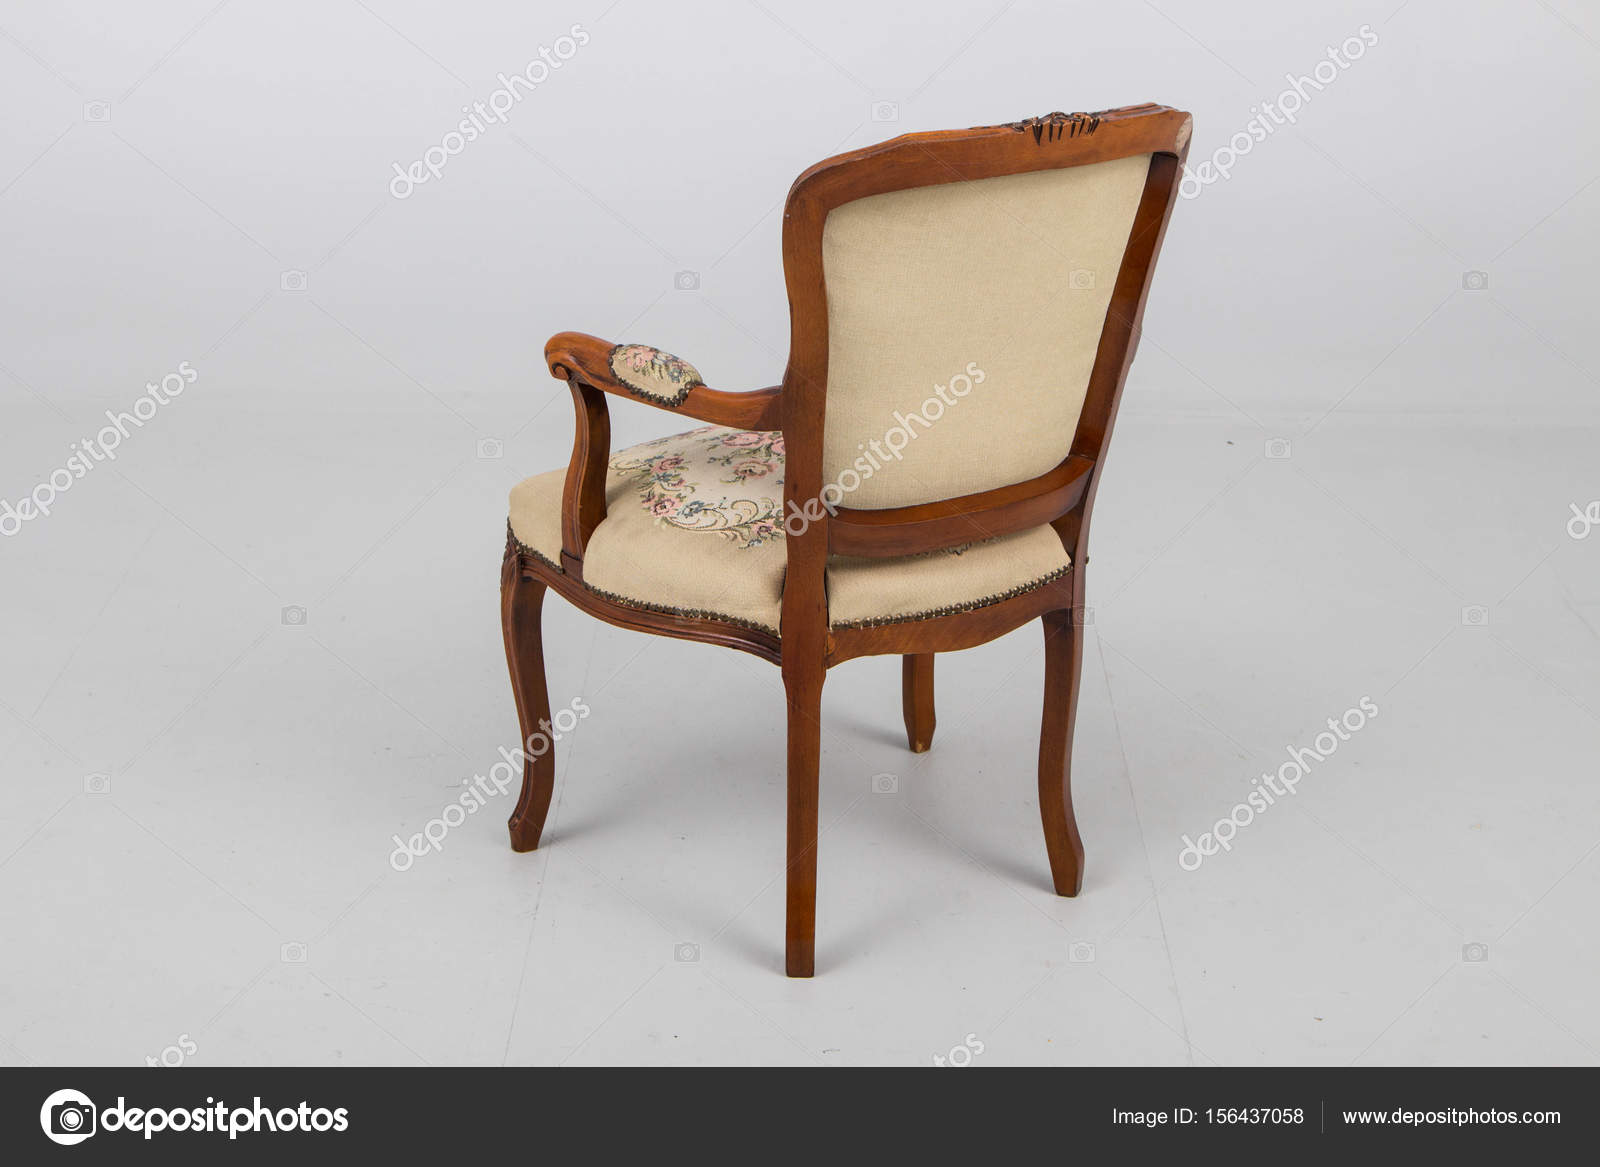 Sedie Poltrone Antiche.Sedie Poltrone Antiche Foto Stock C Jbgroup 156437058